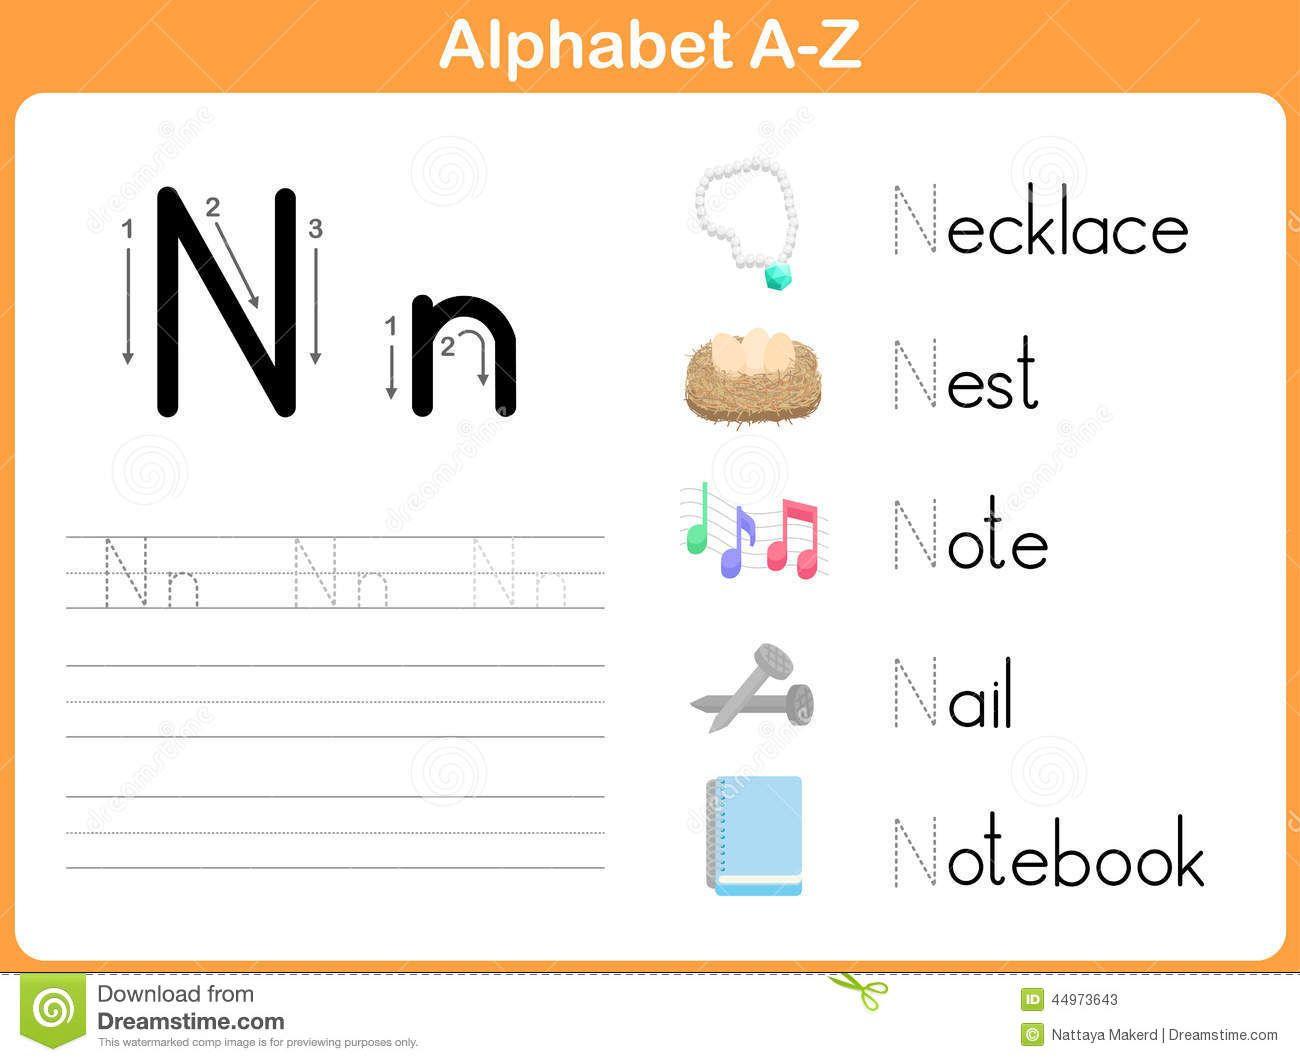 Alphabet Tracing Worksheets A Z - Alphabet Tracing for A-Z Alphabet Tracing Worksheets